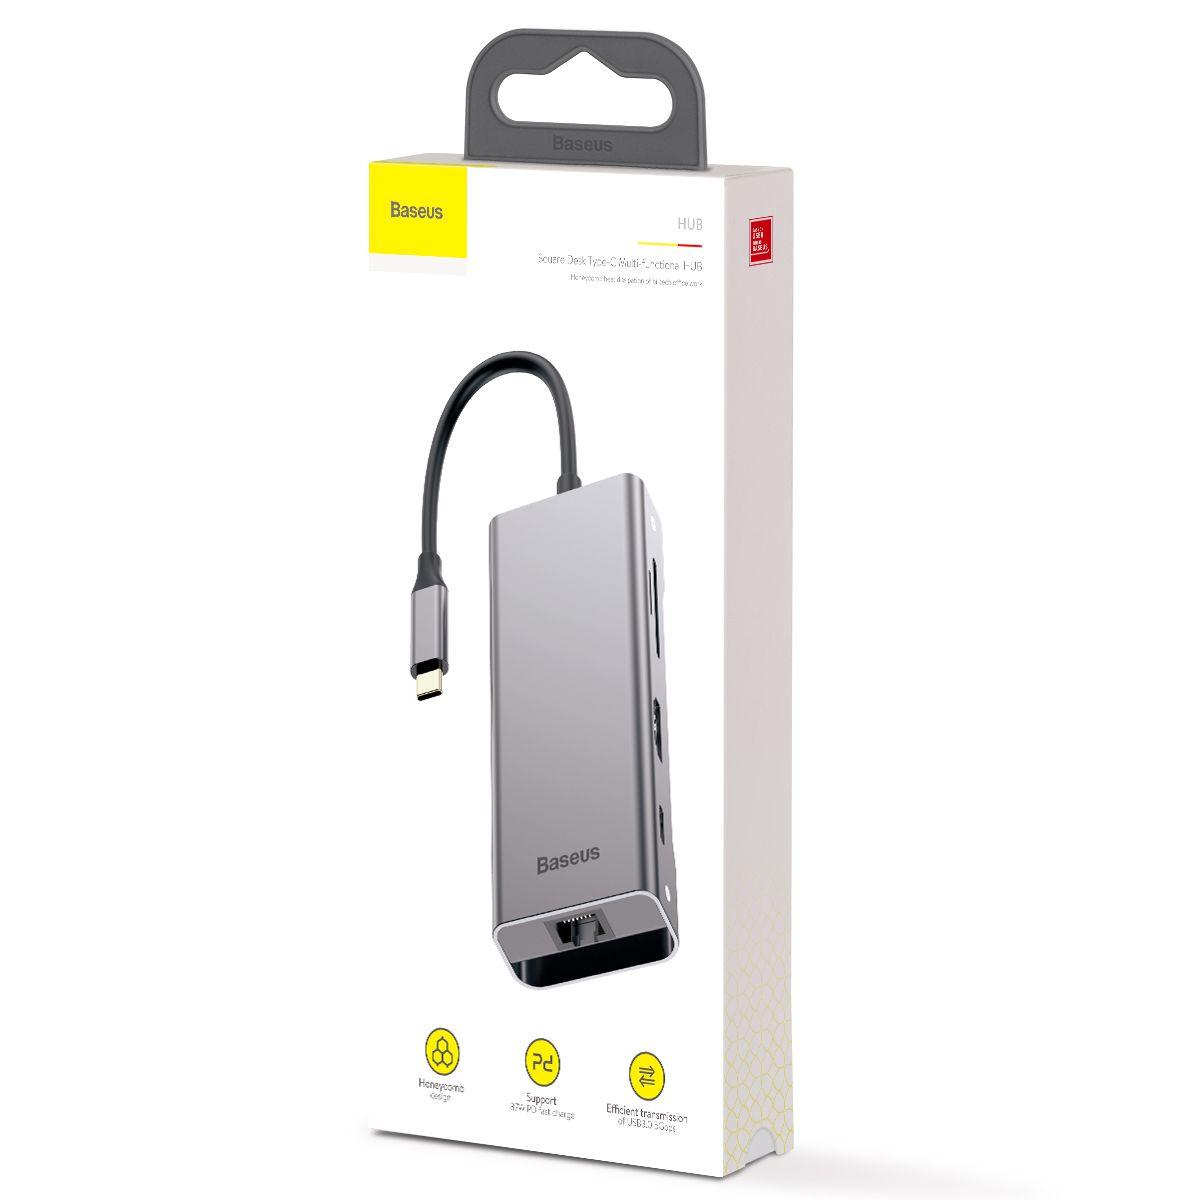 HUB Baseus Square Desk 7n1 Type-C para LAN + 2 USB + SD + MicroSD + Type-C + HDMI 4K